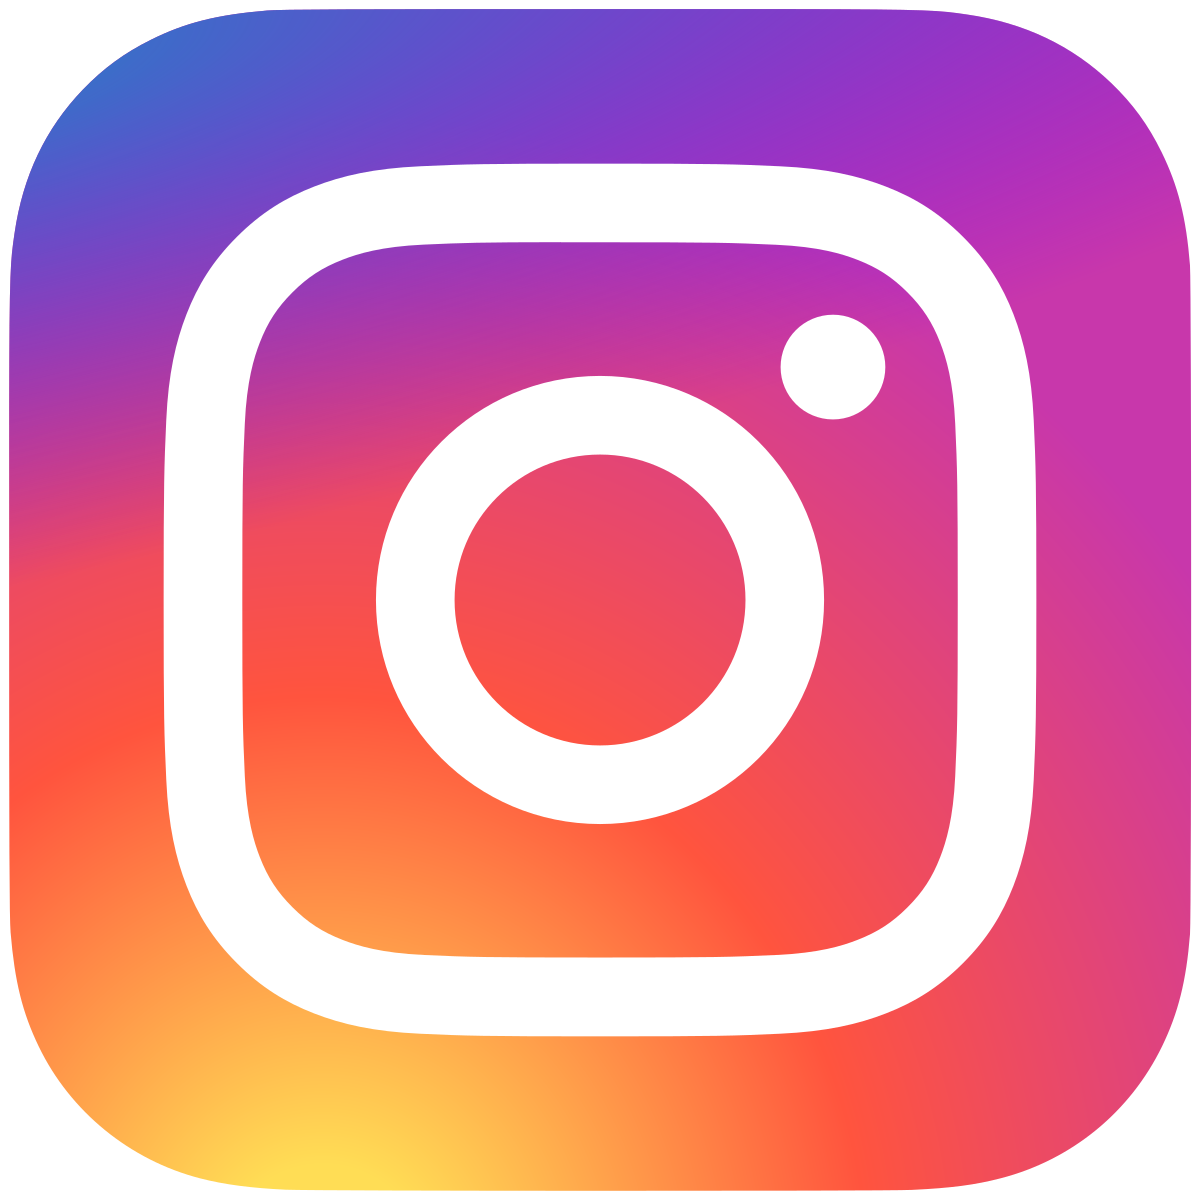 Node.js: ricreare un social network come Instagram in ExpressJS